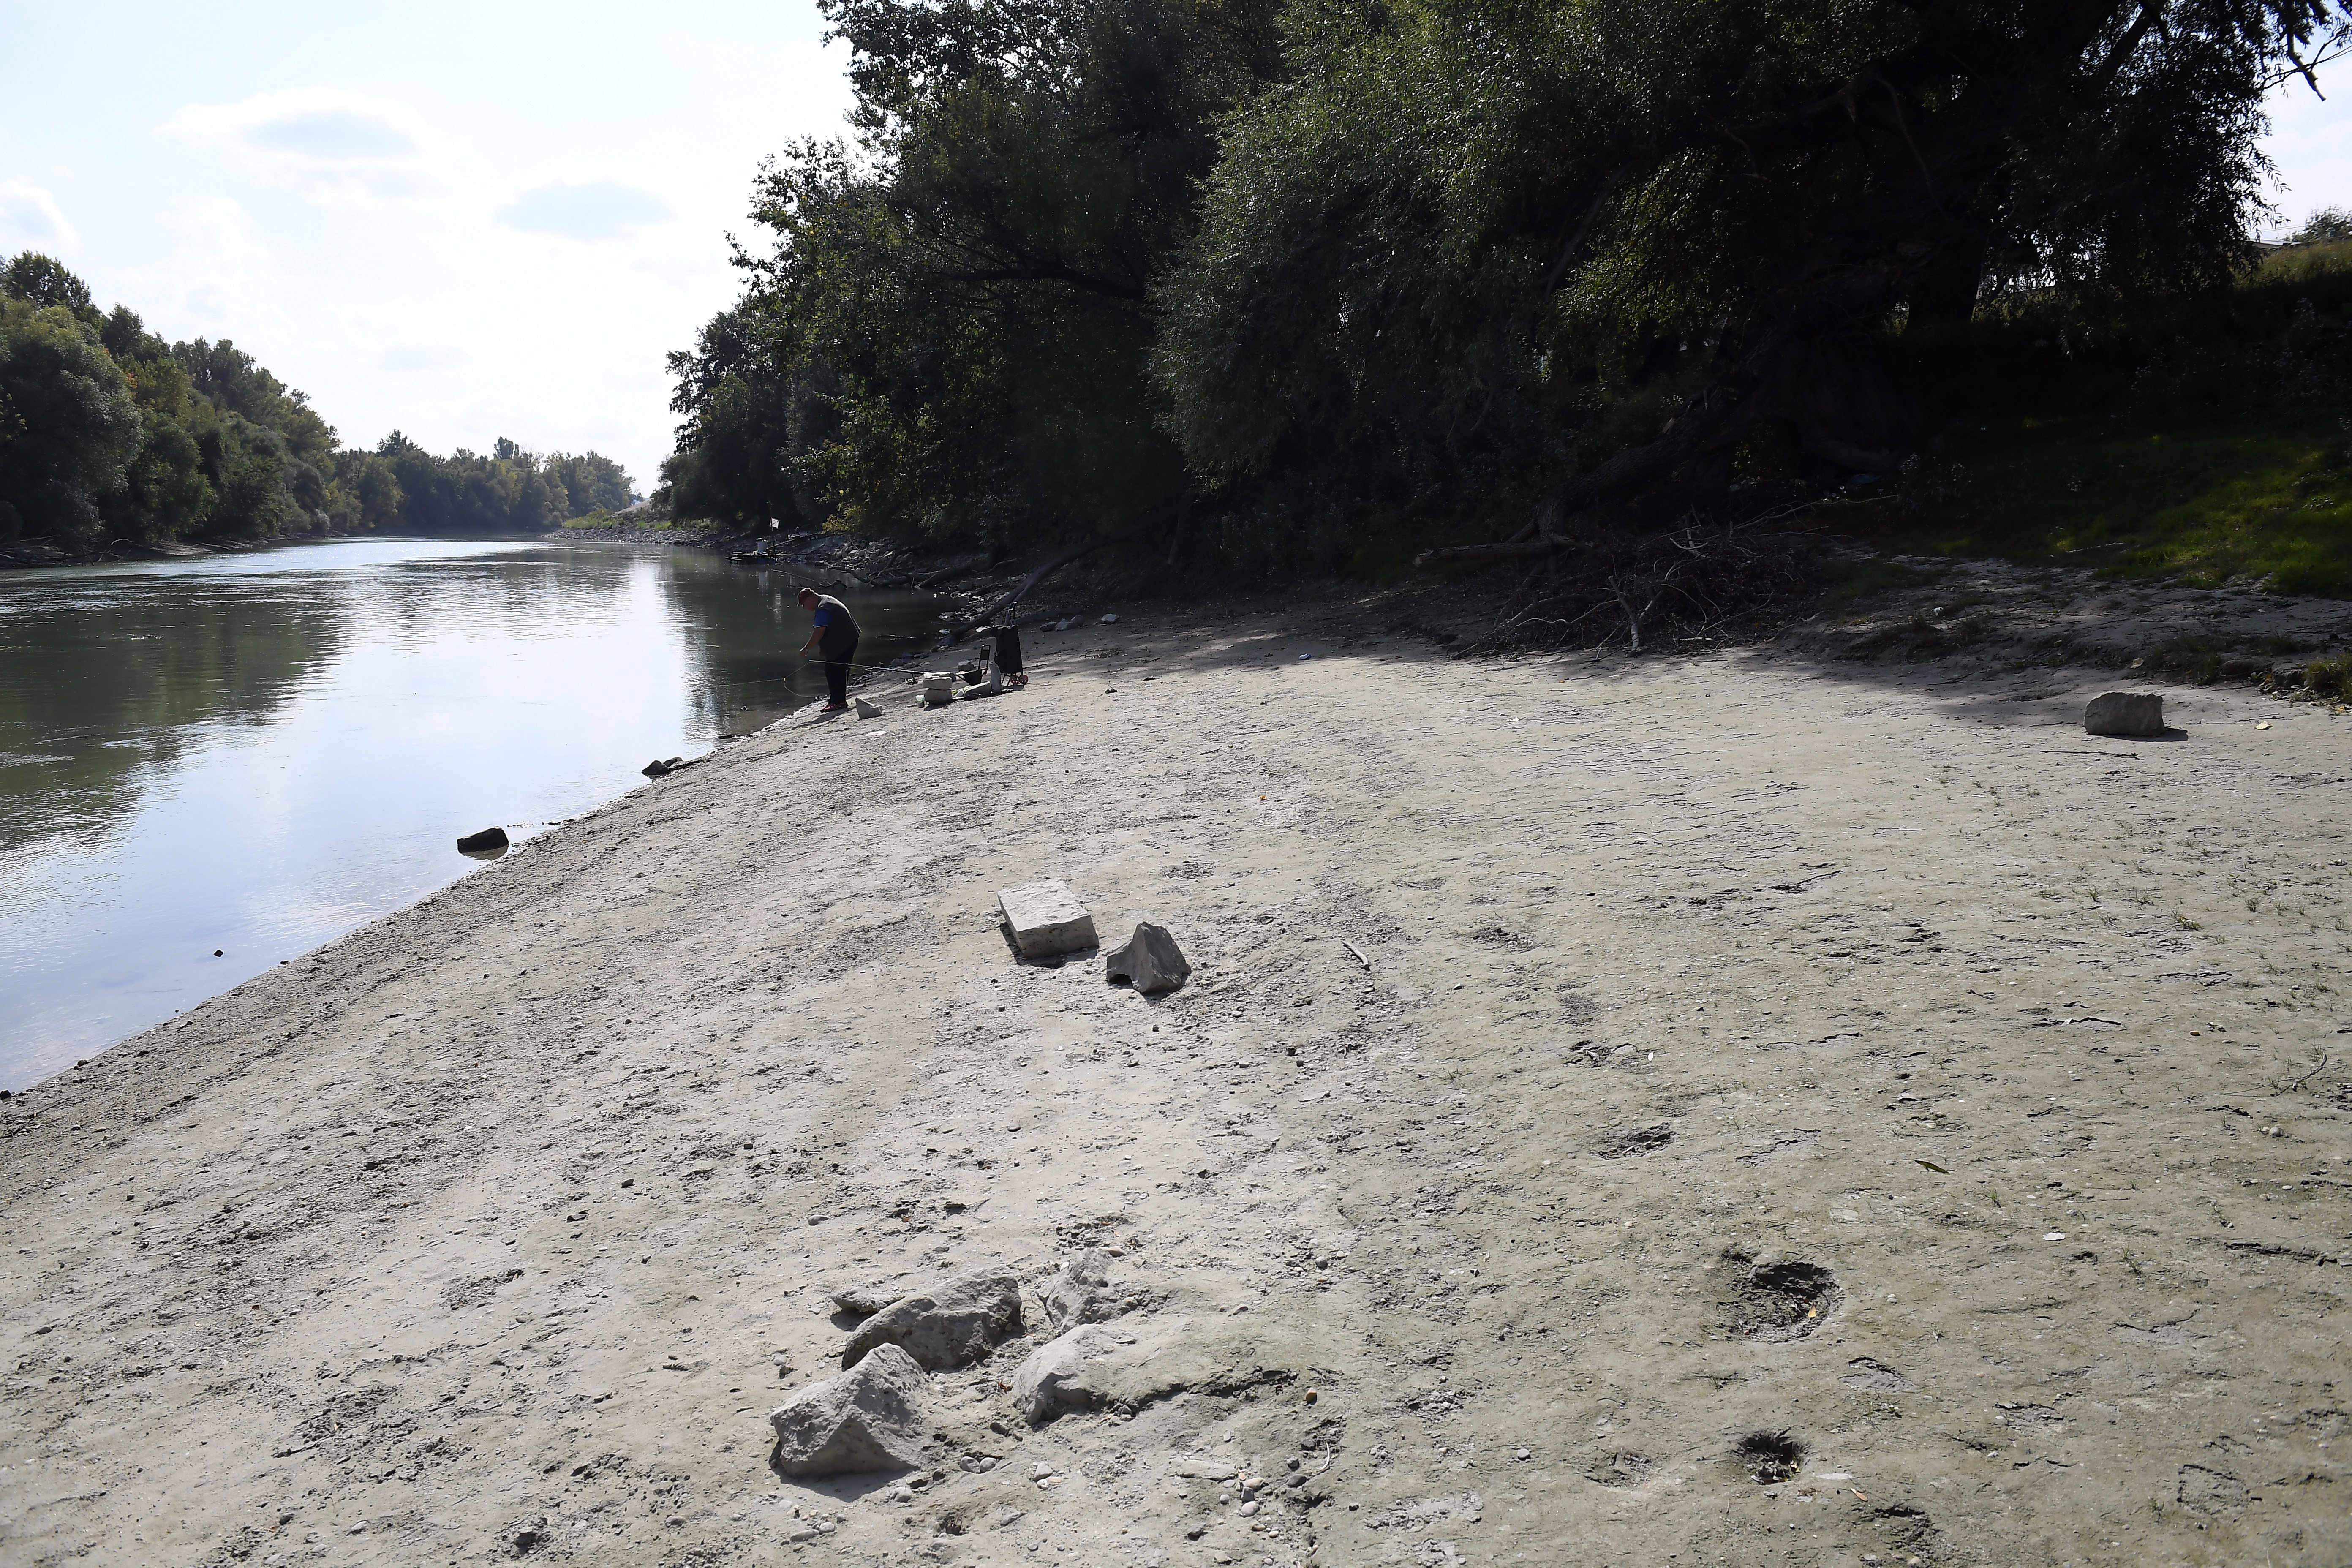 Orvhalászok miatt halhatnak ki a Duna tokhalfajai